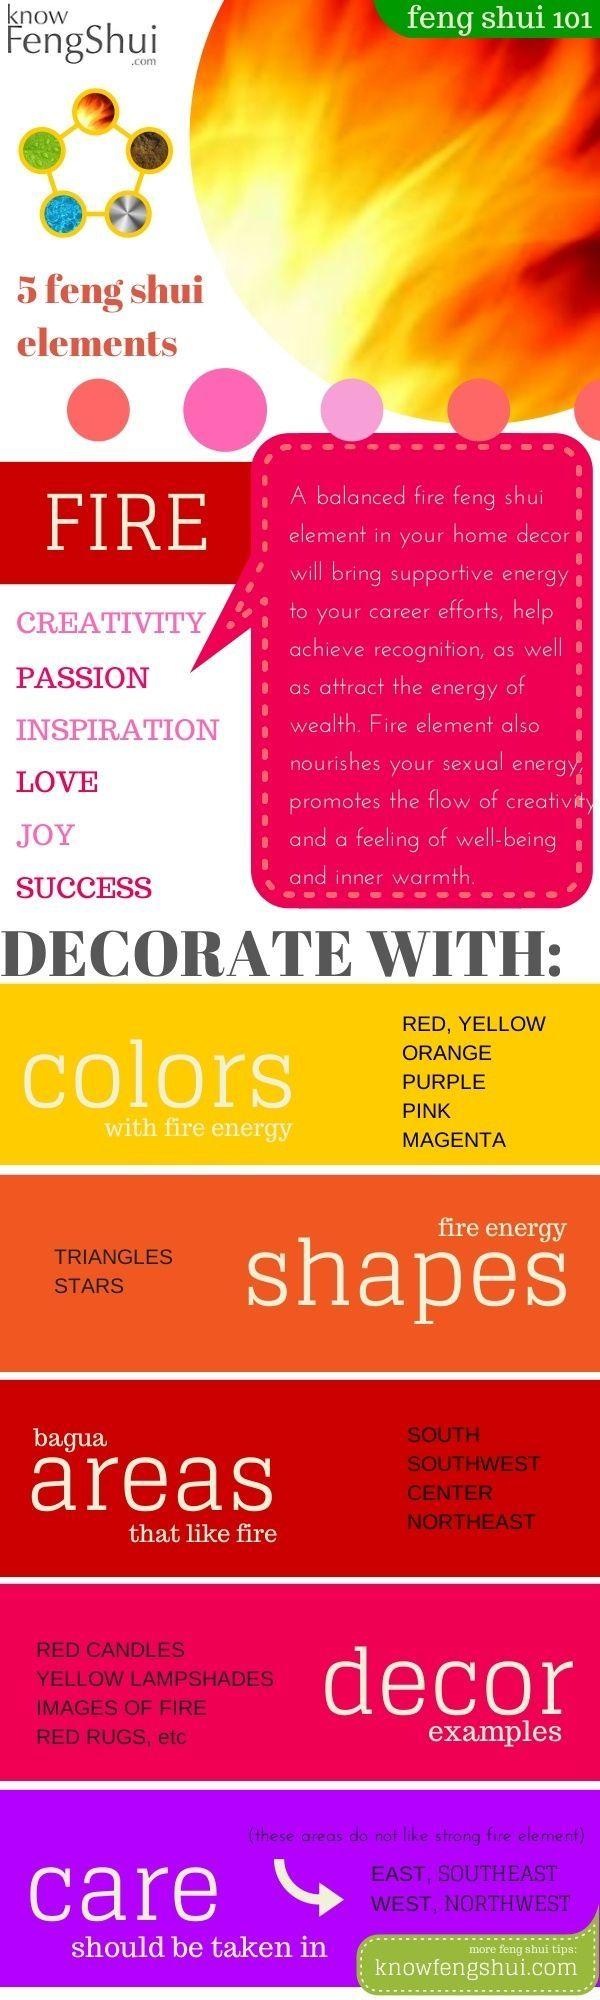 fire-feng-shui-decor-infographic